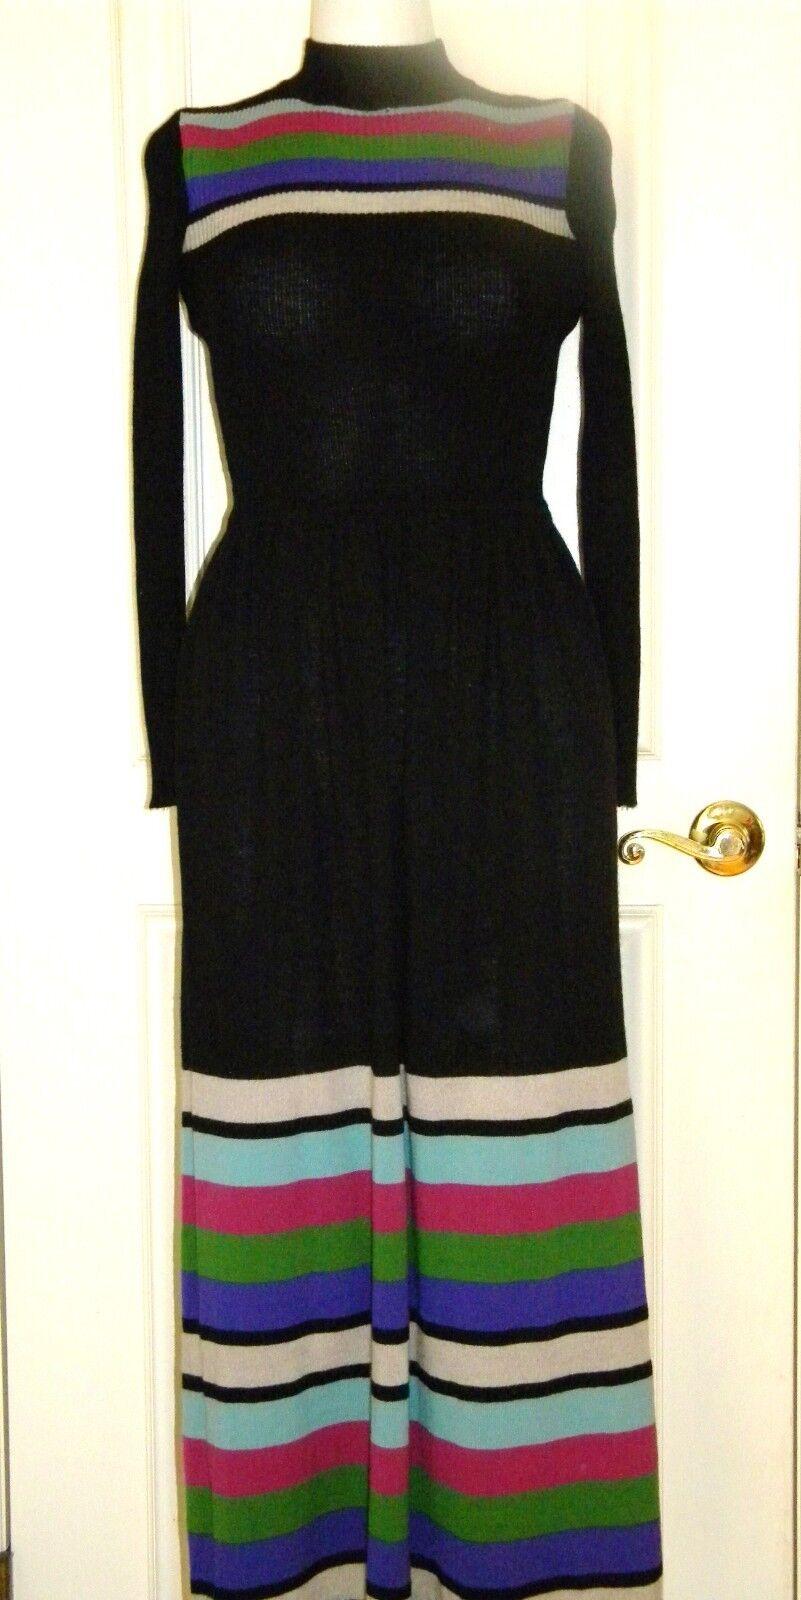 Vintage sweater dress Italian wool turtleneck maxi XS schwarz Farbe stripes